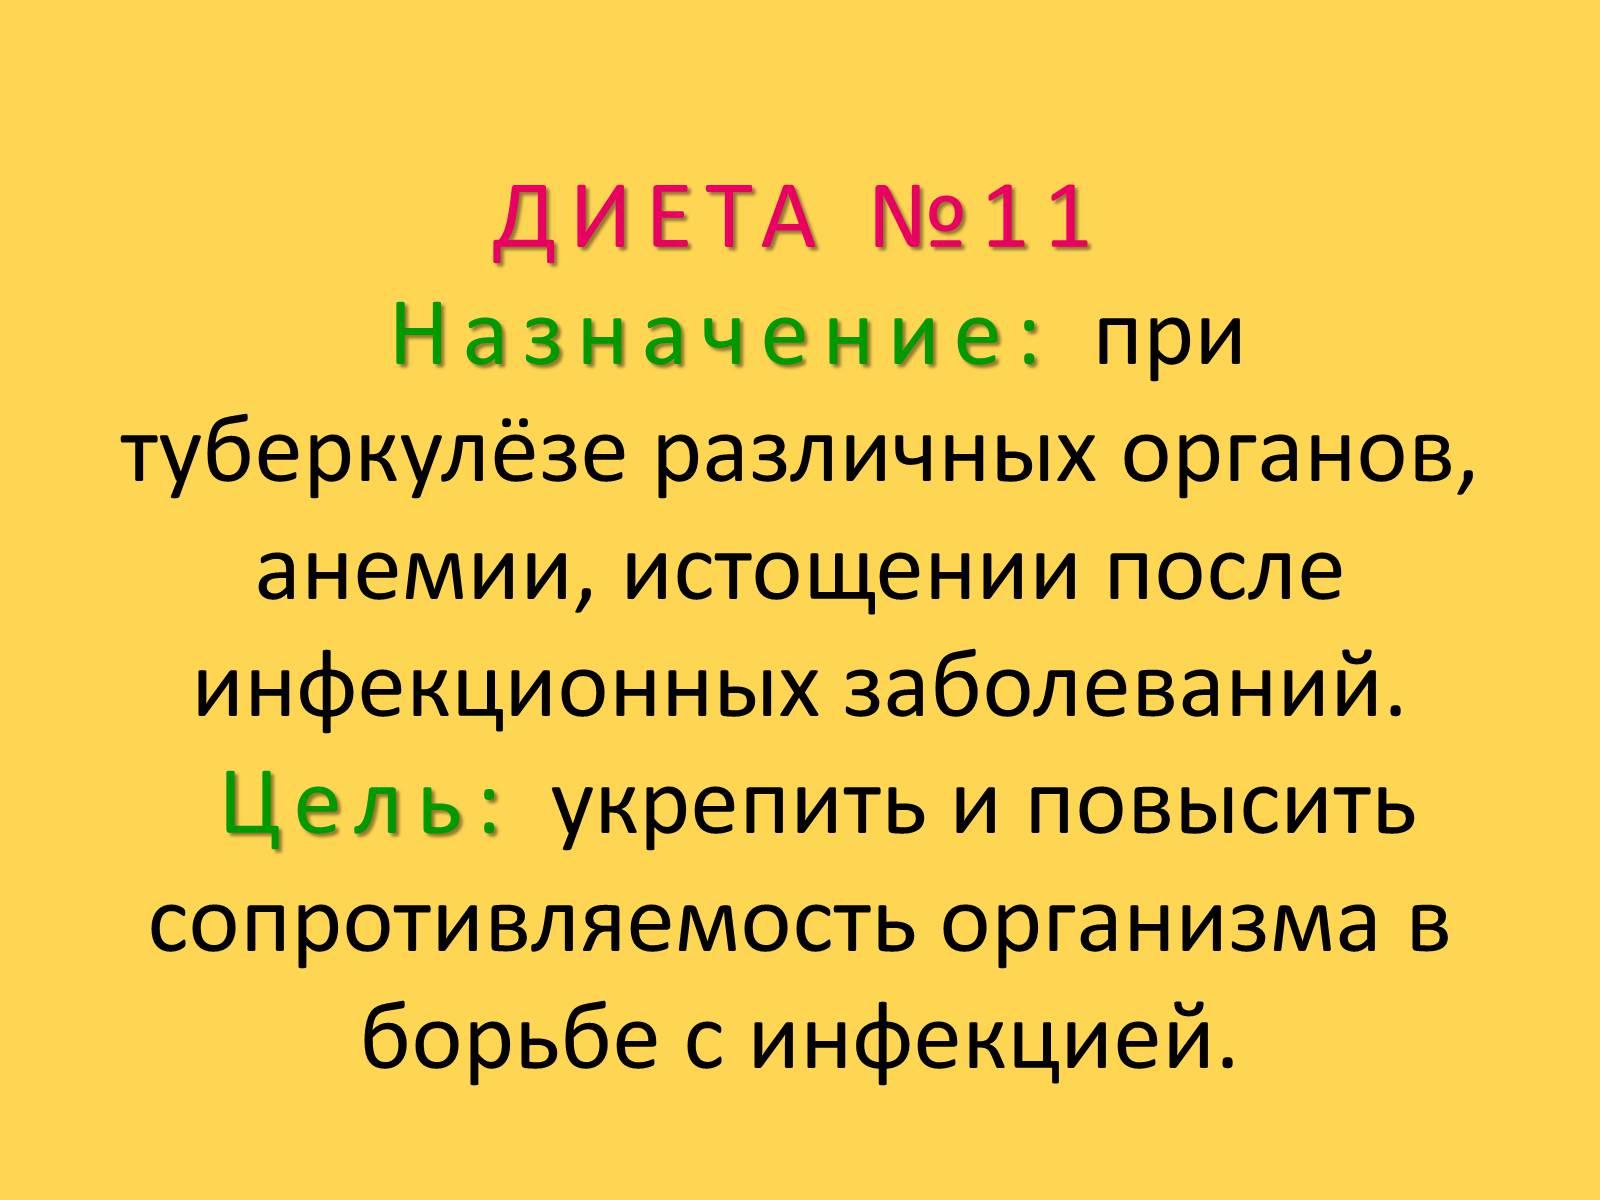 Диета Номер 11 Назначается При